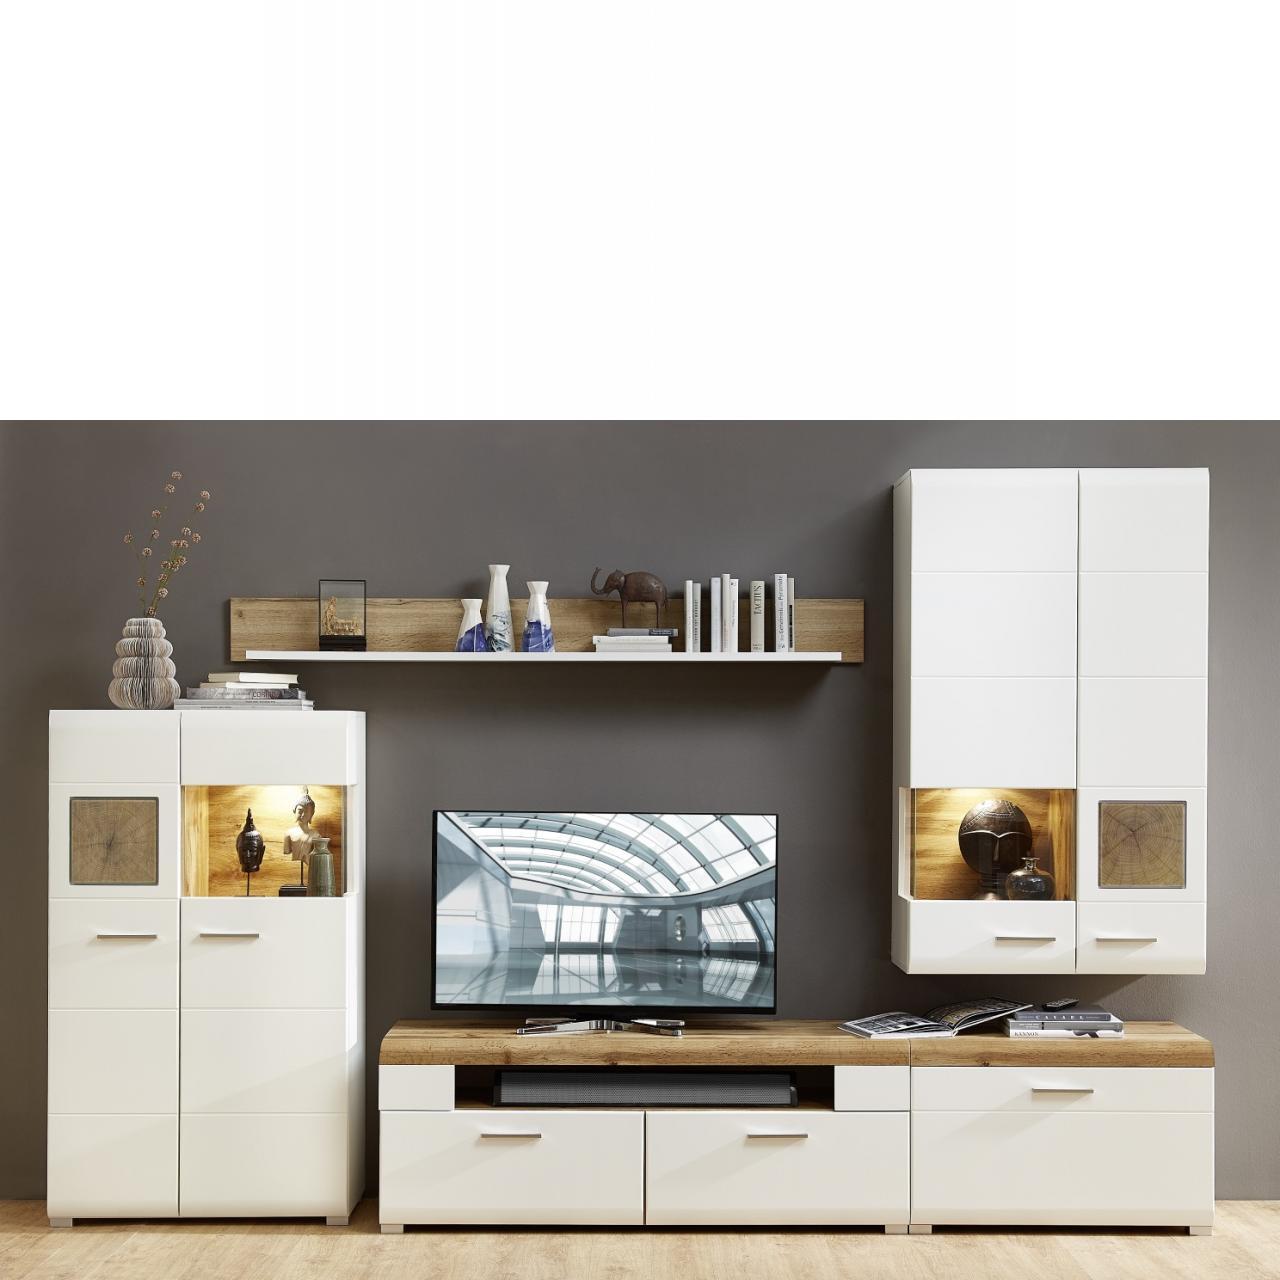 Wohnwand Fun Plus 320x205x47 cm, weiß matt, Hirnholz, Schrankwand, 4-teilig